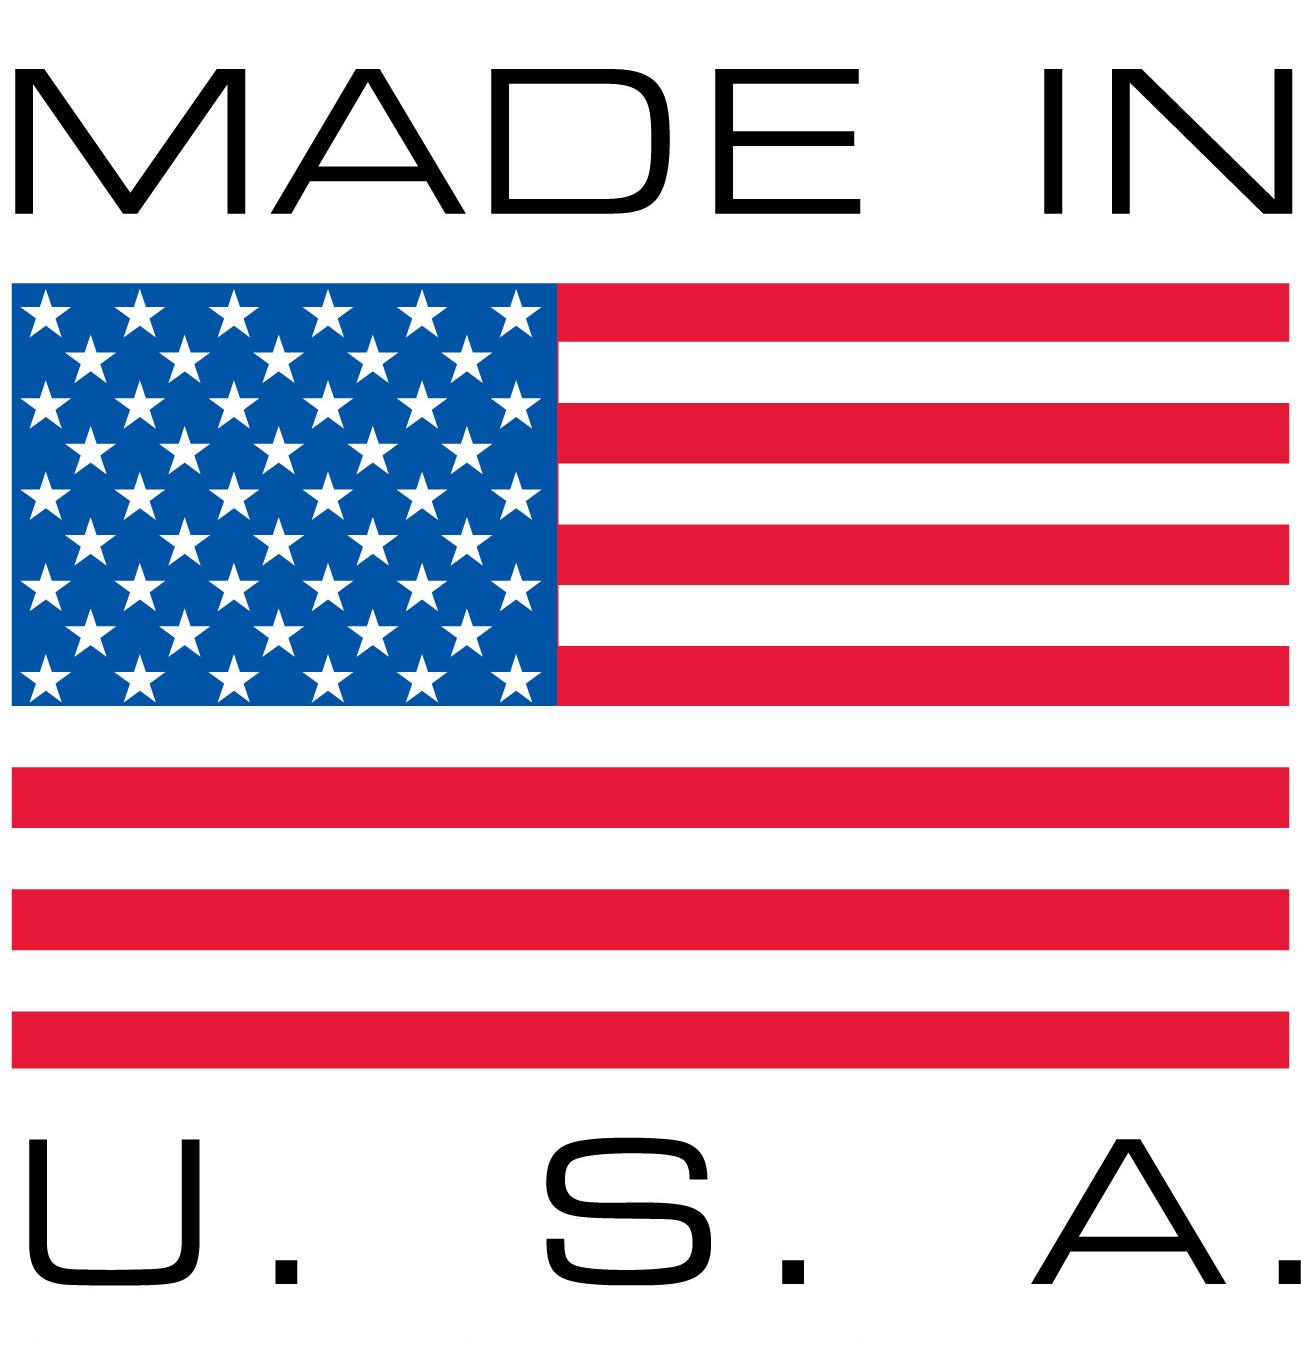 http://2.bp.blogspot.com/-PZw0YWxpL9I/UKUYFUzNHrI/AAAAAAAAADQ/DFdQN35gR9U/s1600/Made+IN+USA.jpg